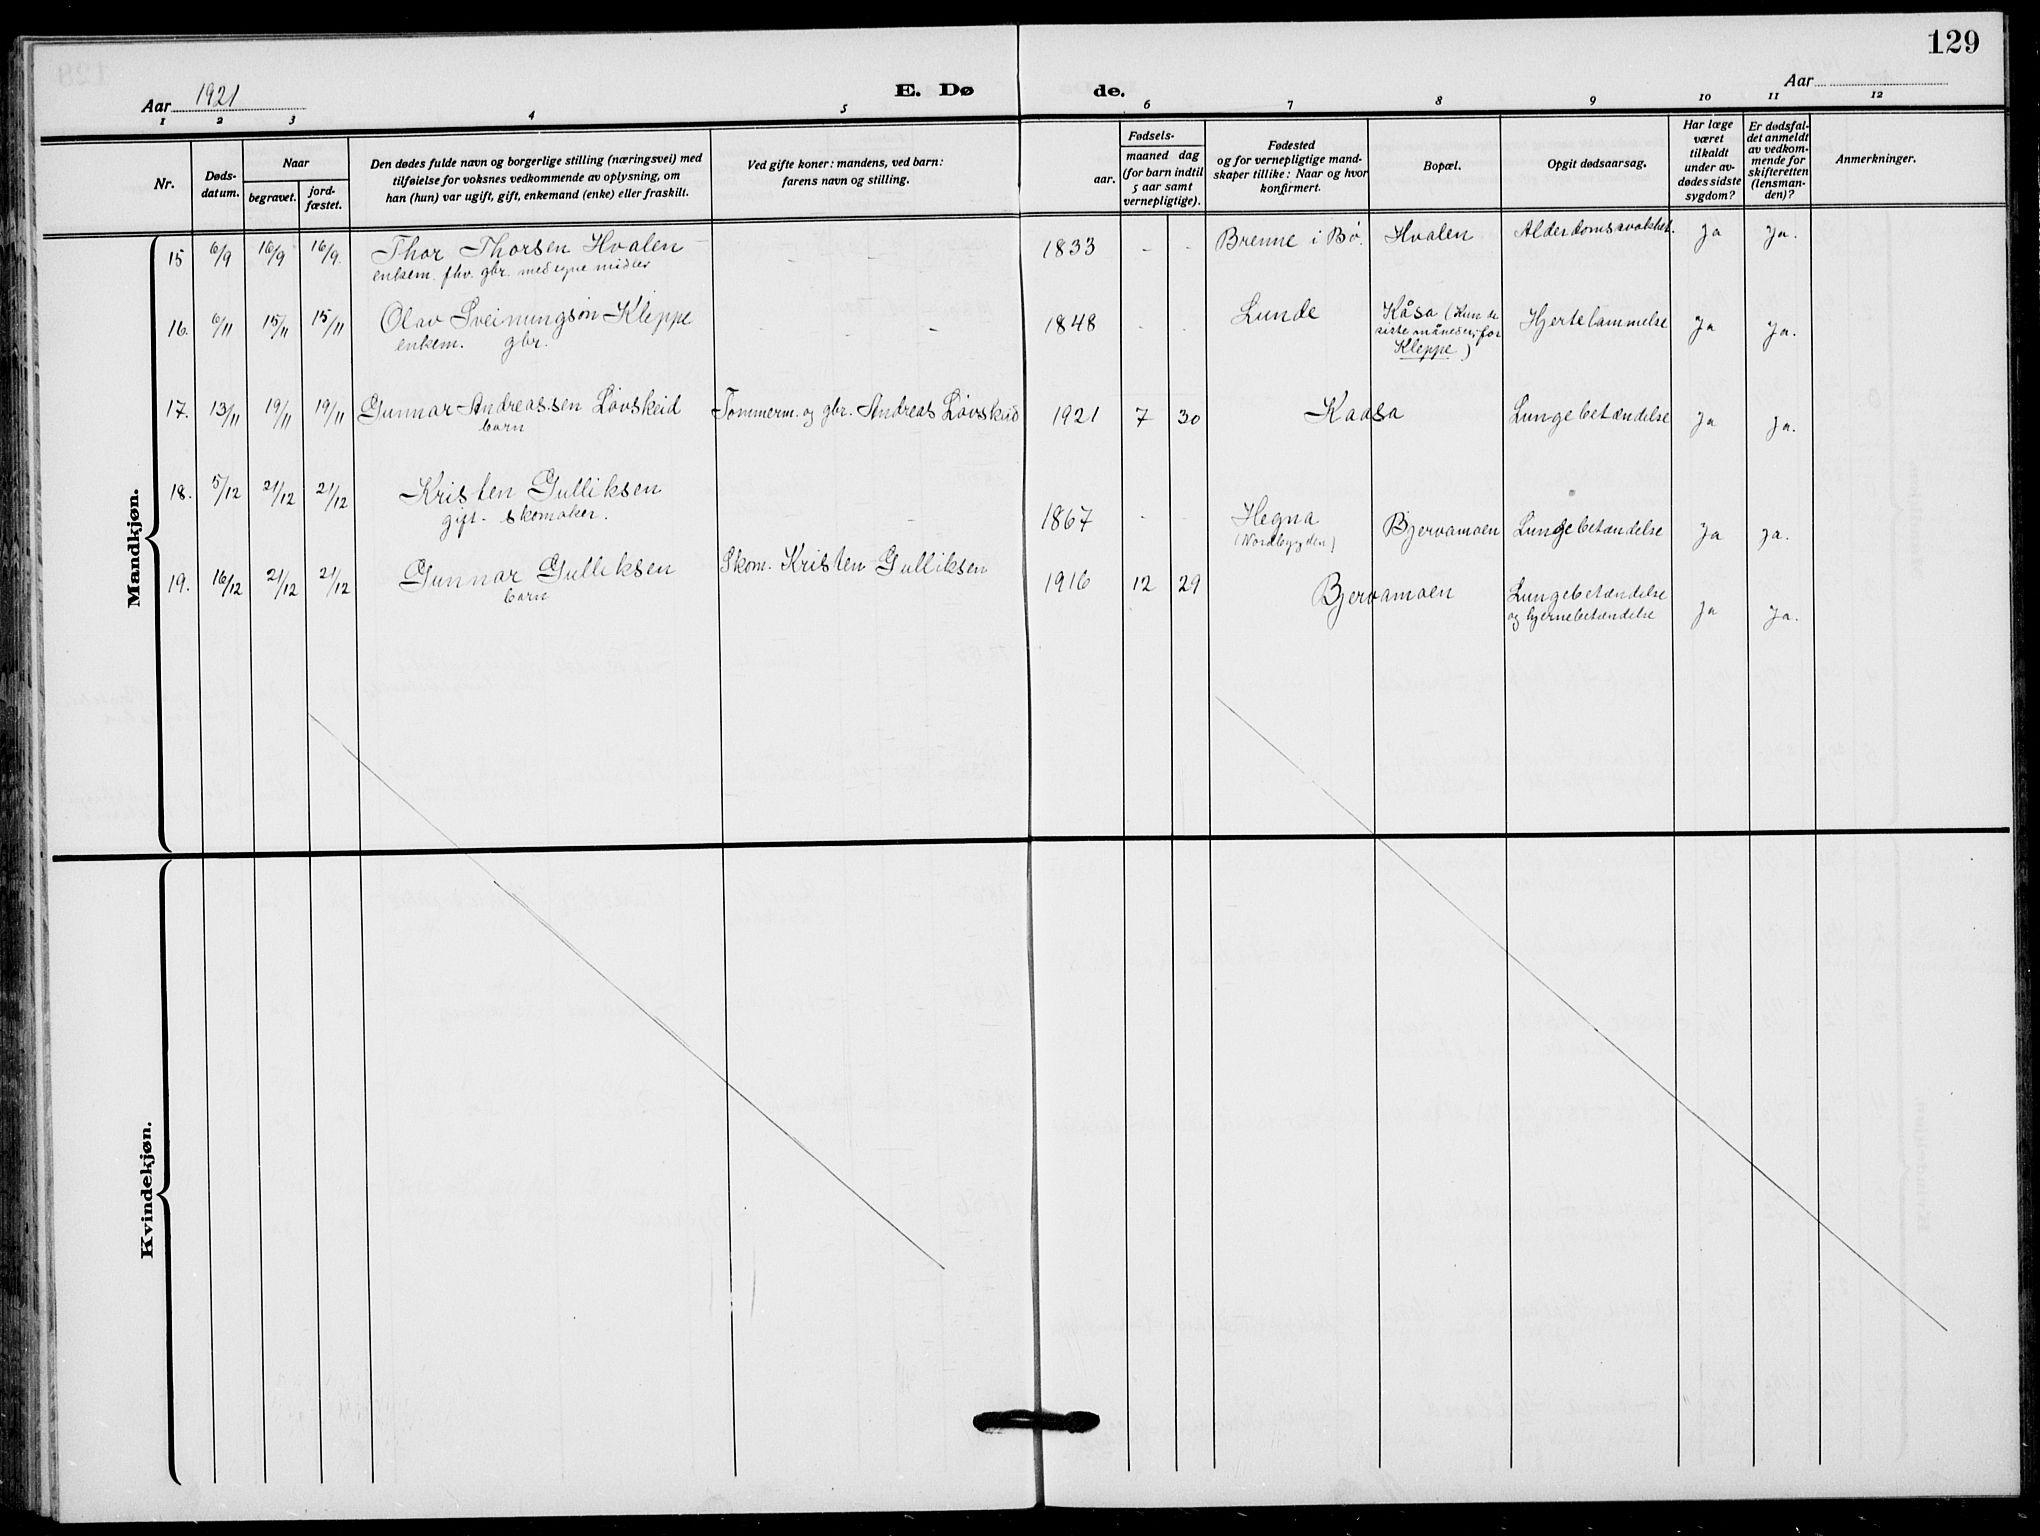 SAKO, Lunde kirkebøker, F/Fa/L0005: Ministerialbok nr. I 5, 1914-1922, s. 129